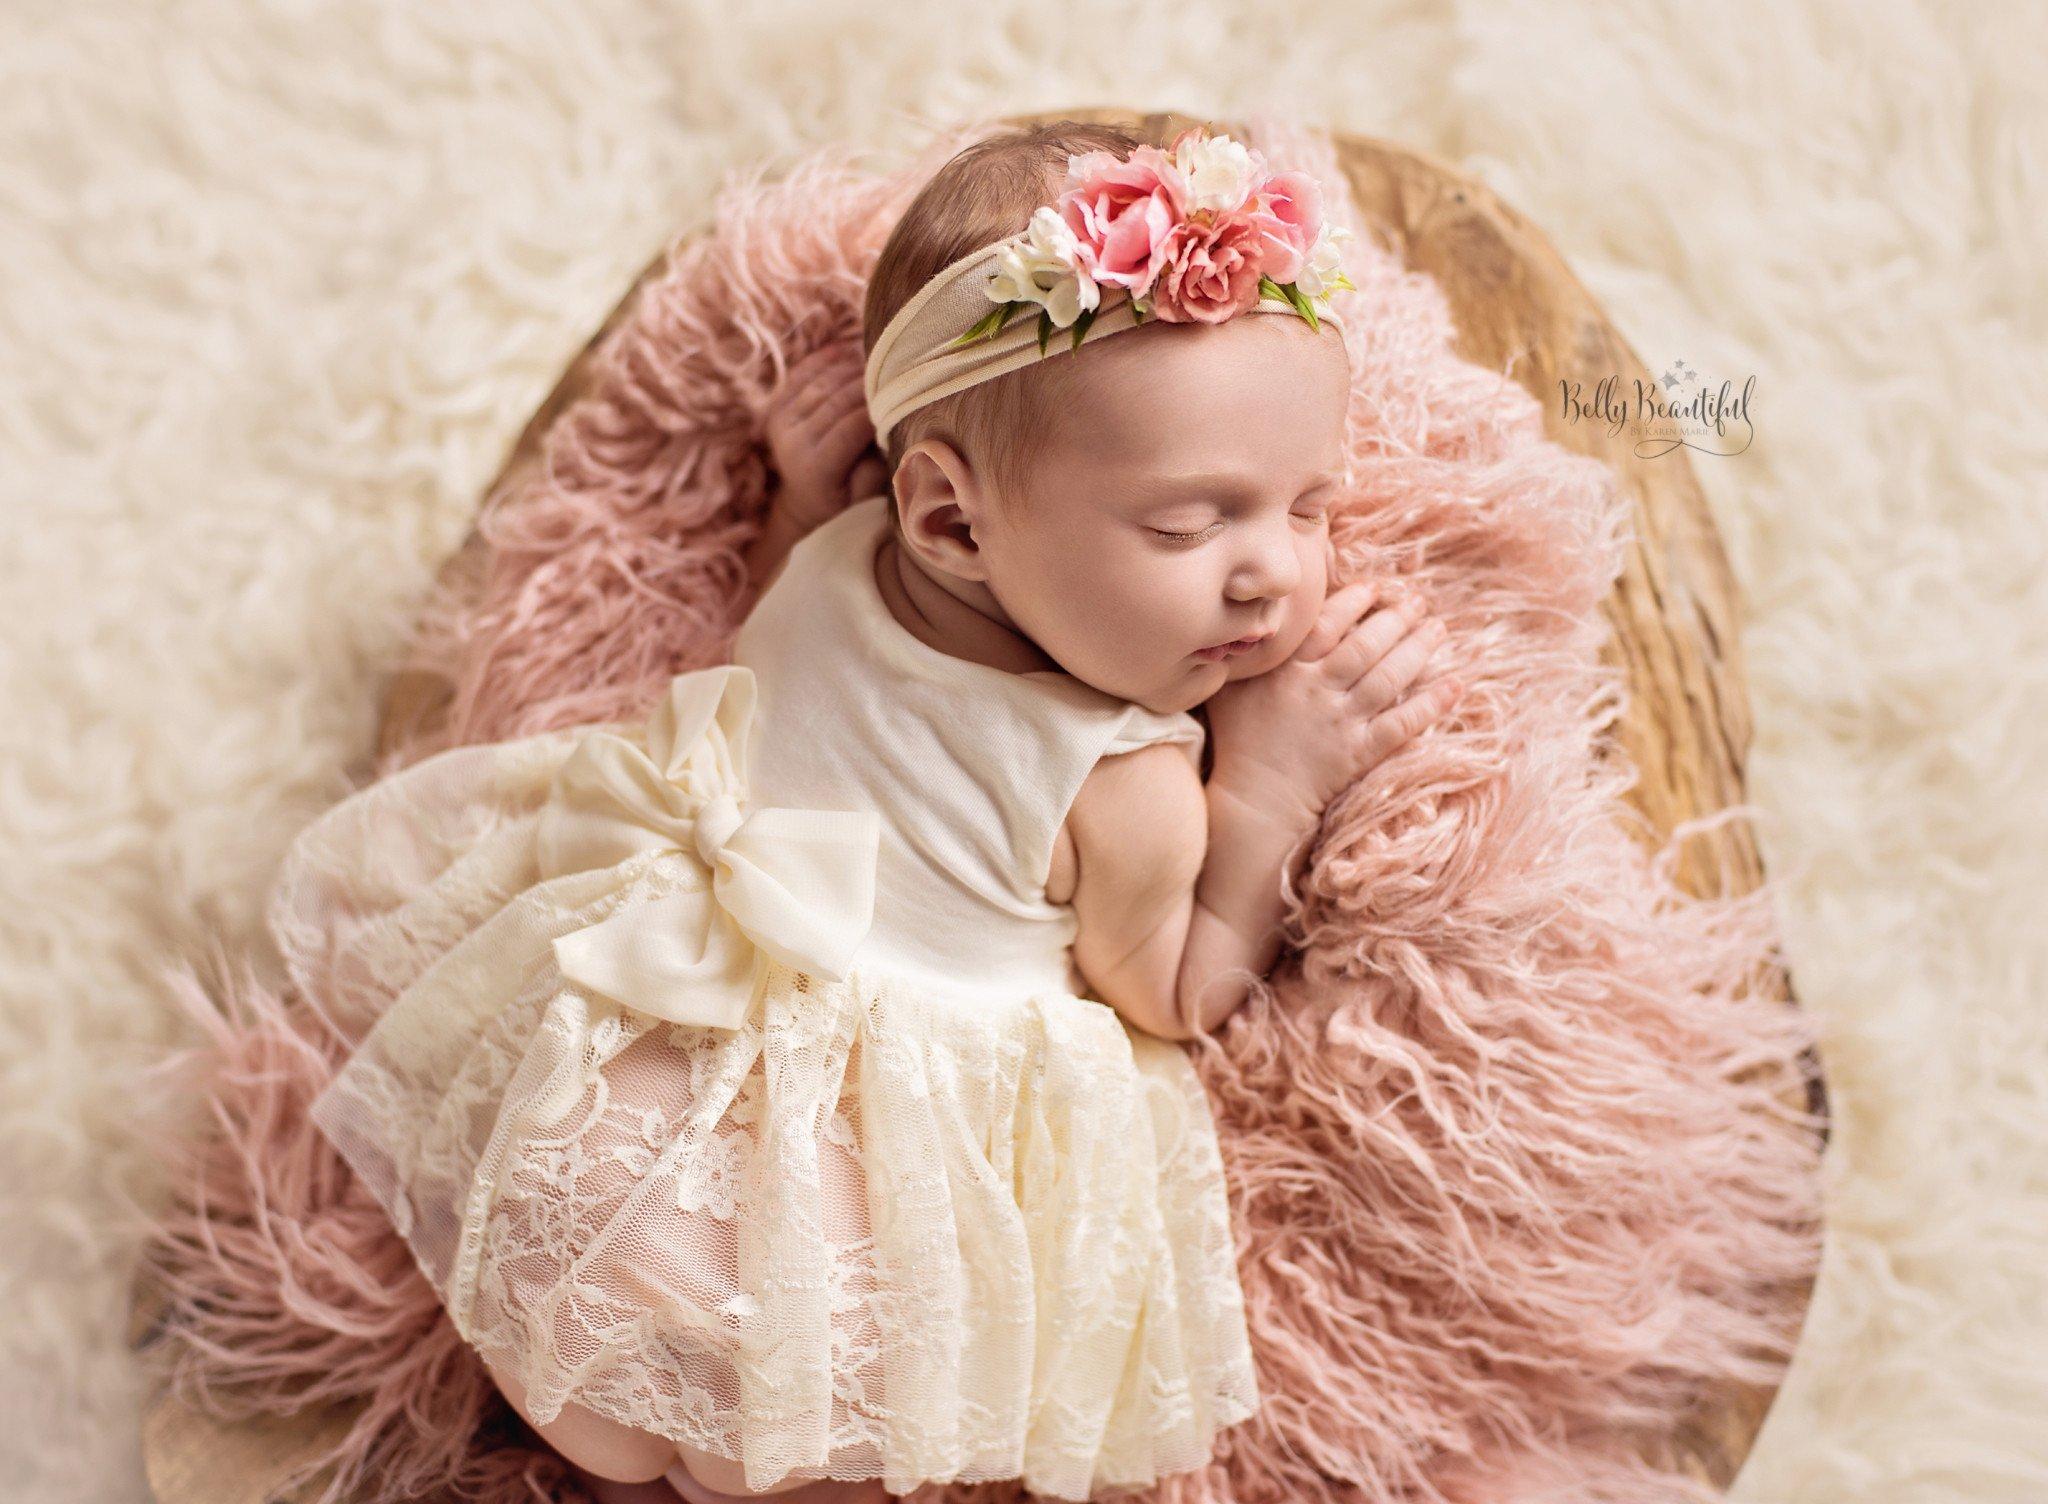 newborn photography tips image